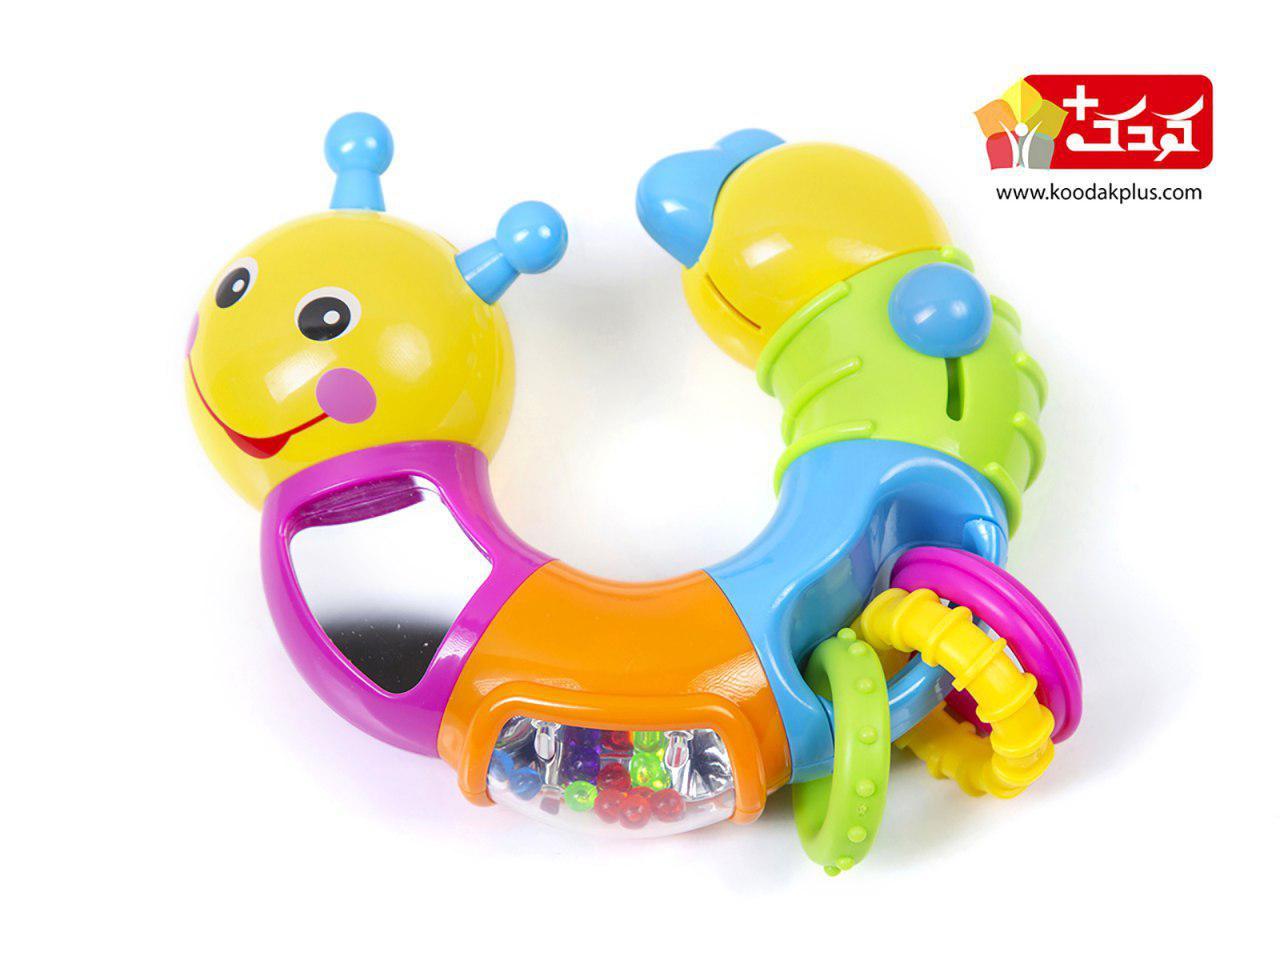 جغجغه نشکن هولی تویز مدل کرم موزیکالlovely worm-736B